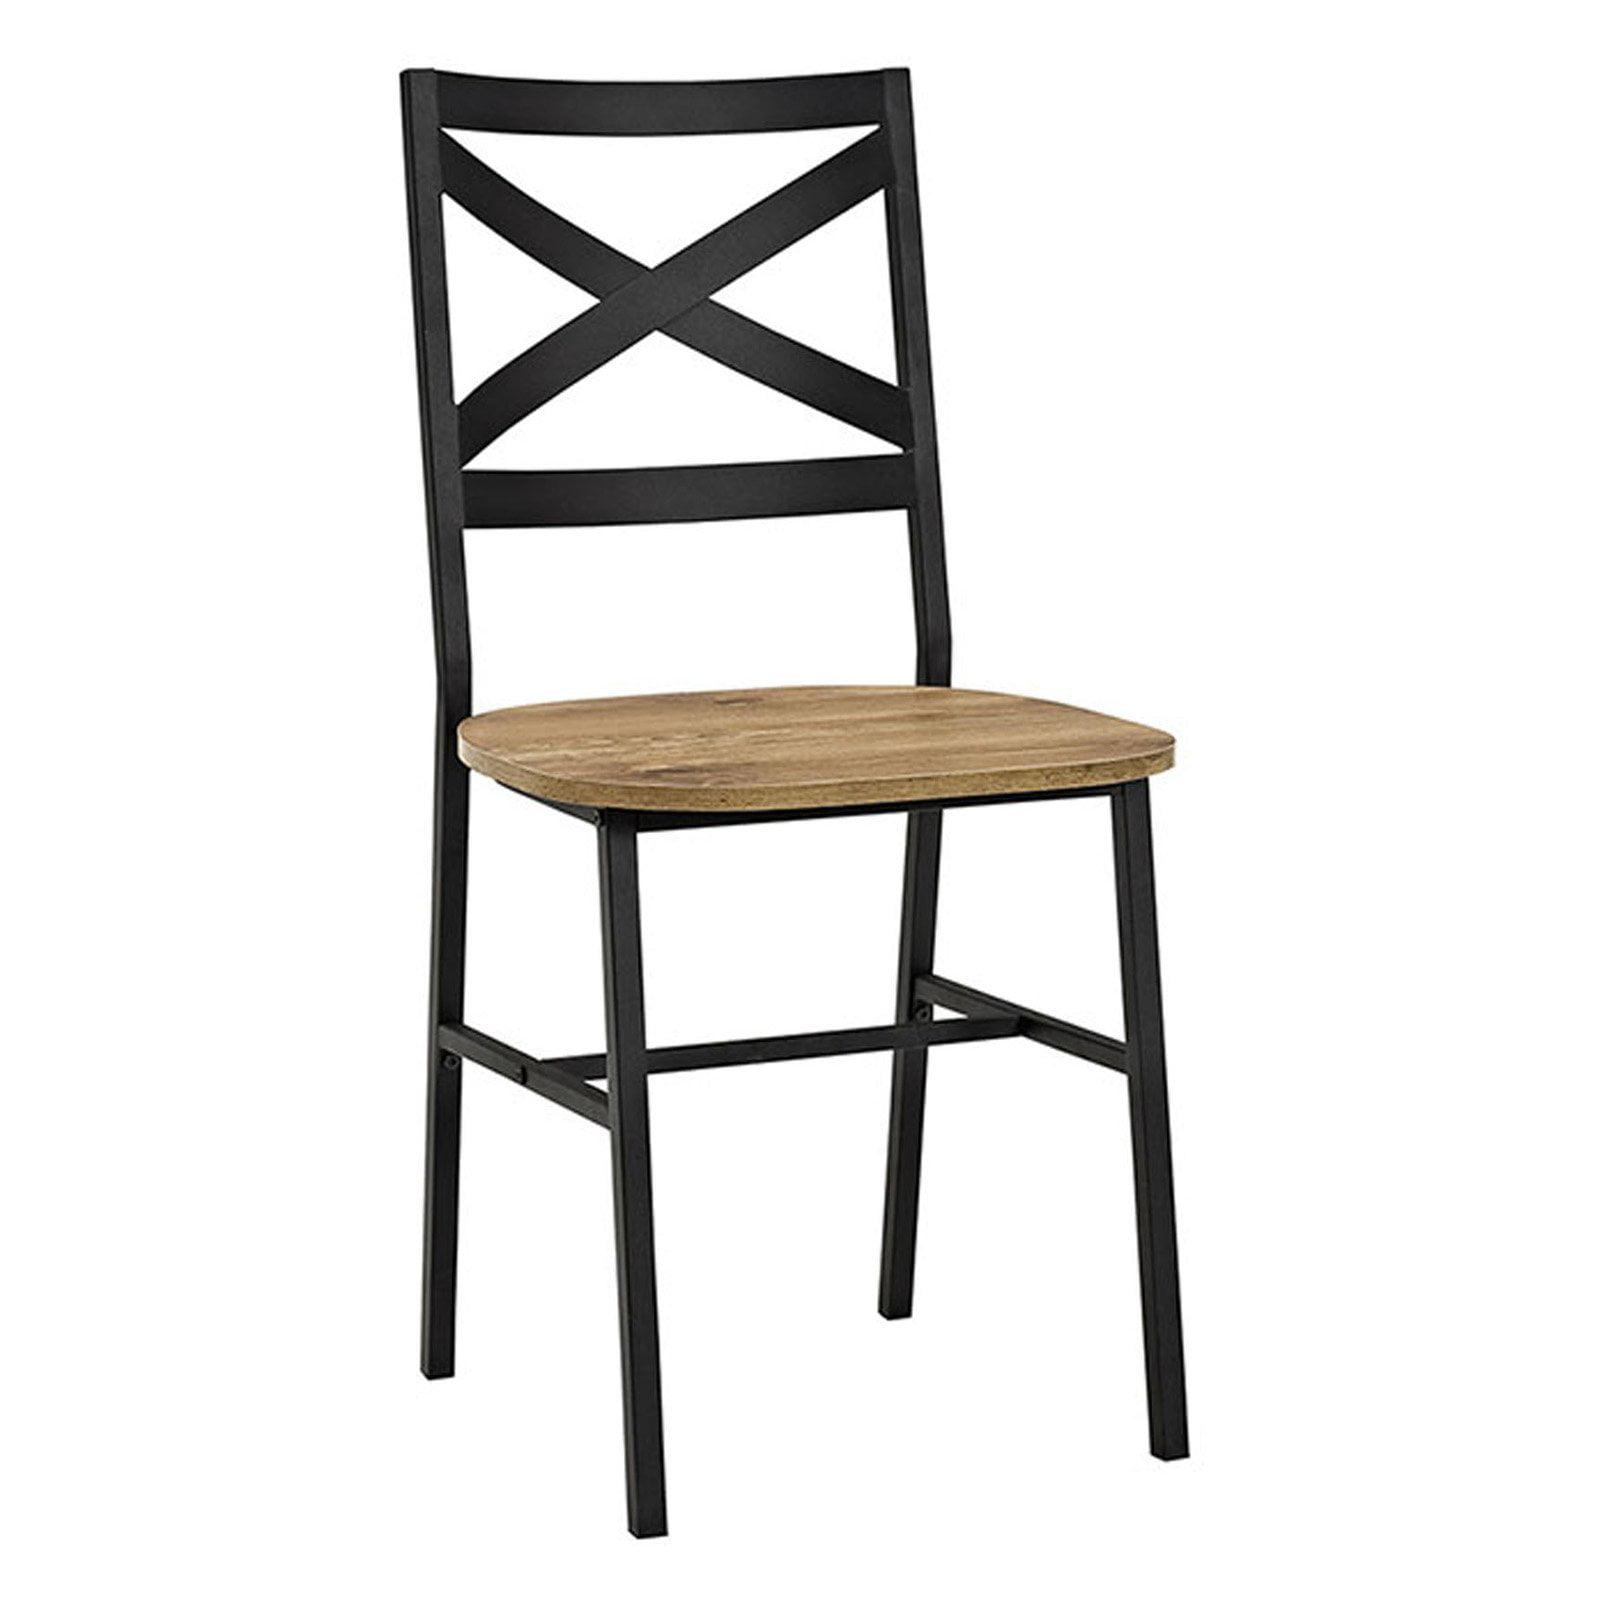 Walker Edison Metal Cross Back Dining Chair - Set of 2